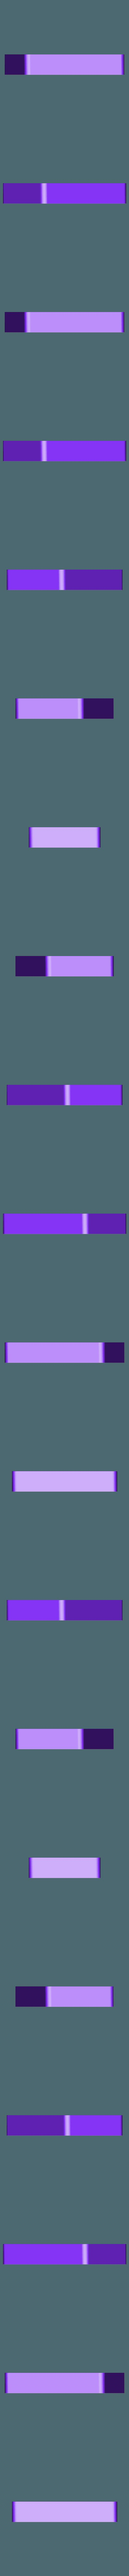 2-set-NMBR9 Insert.STL Download free STL file NMBR9 Box Insert • 3D print template, nickgrawburg